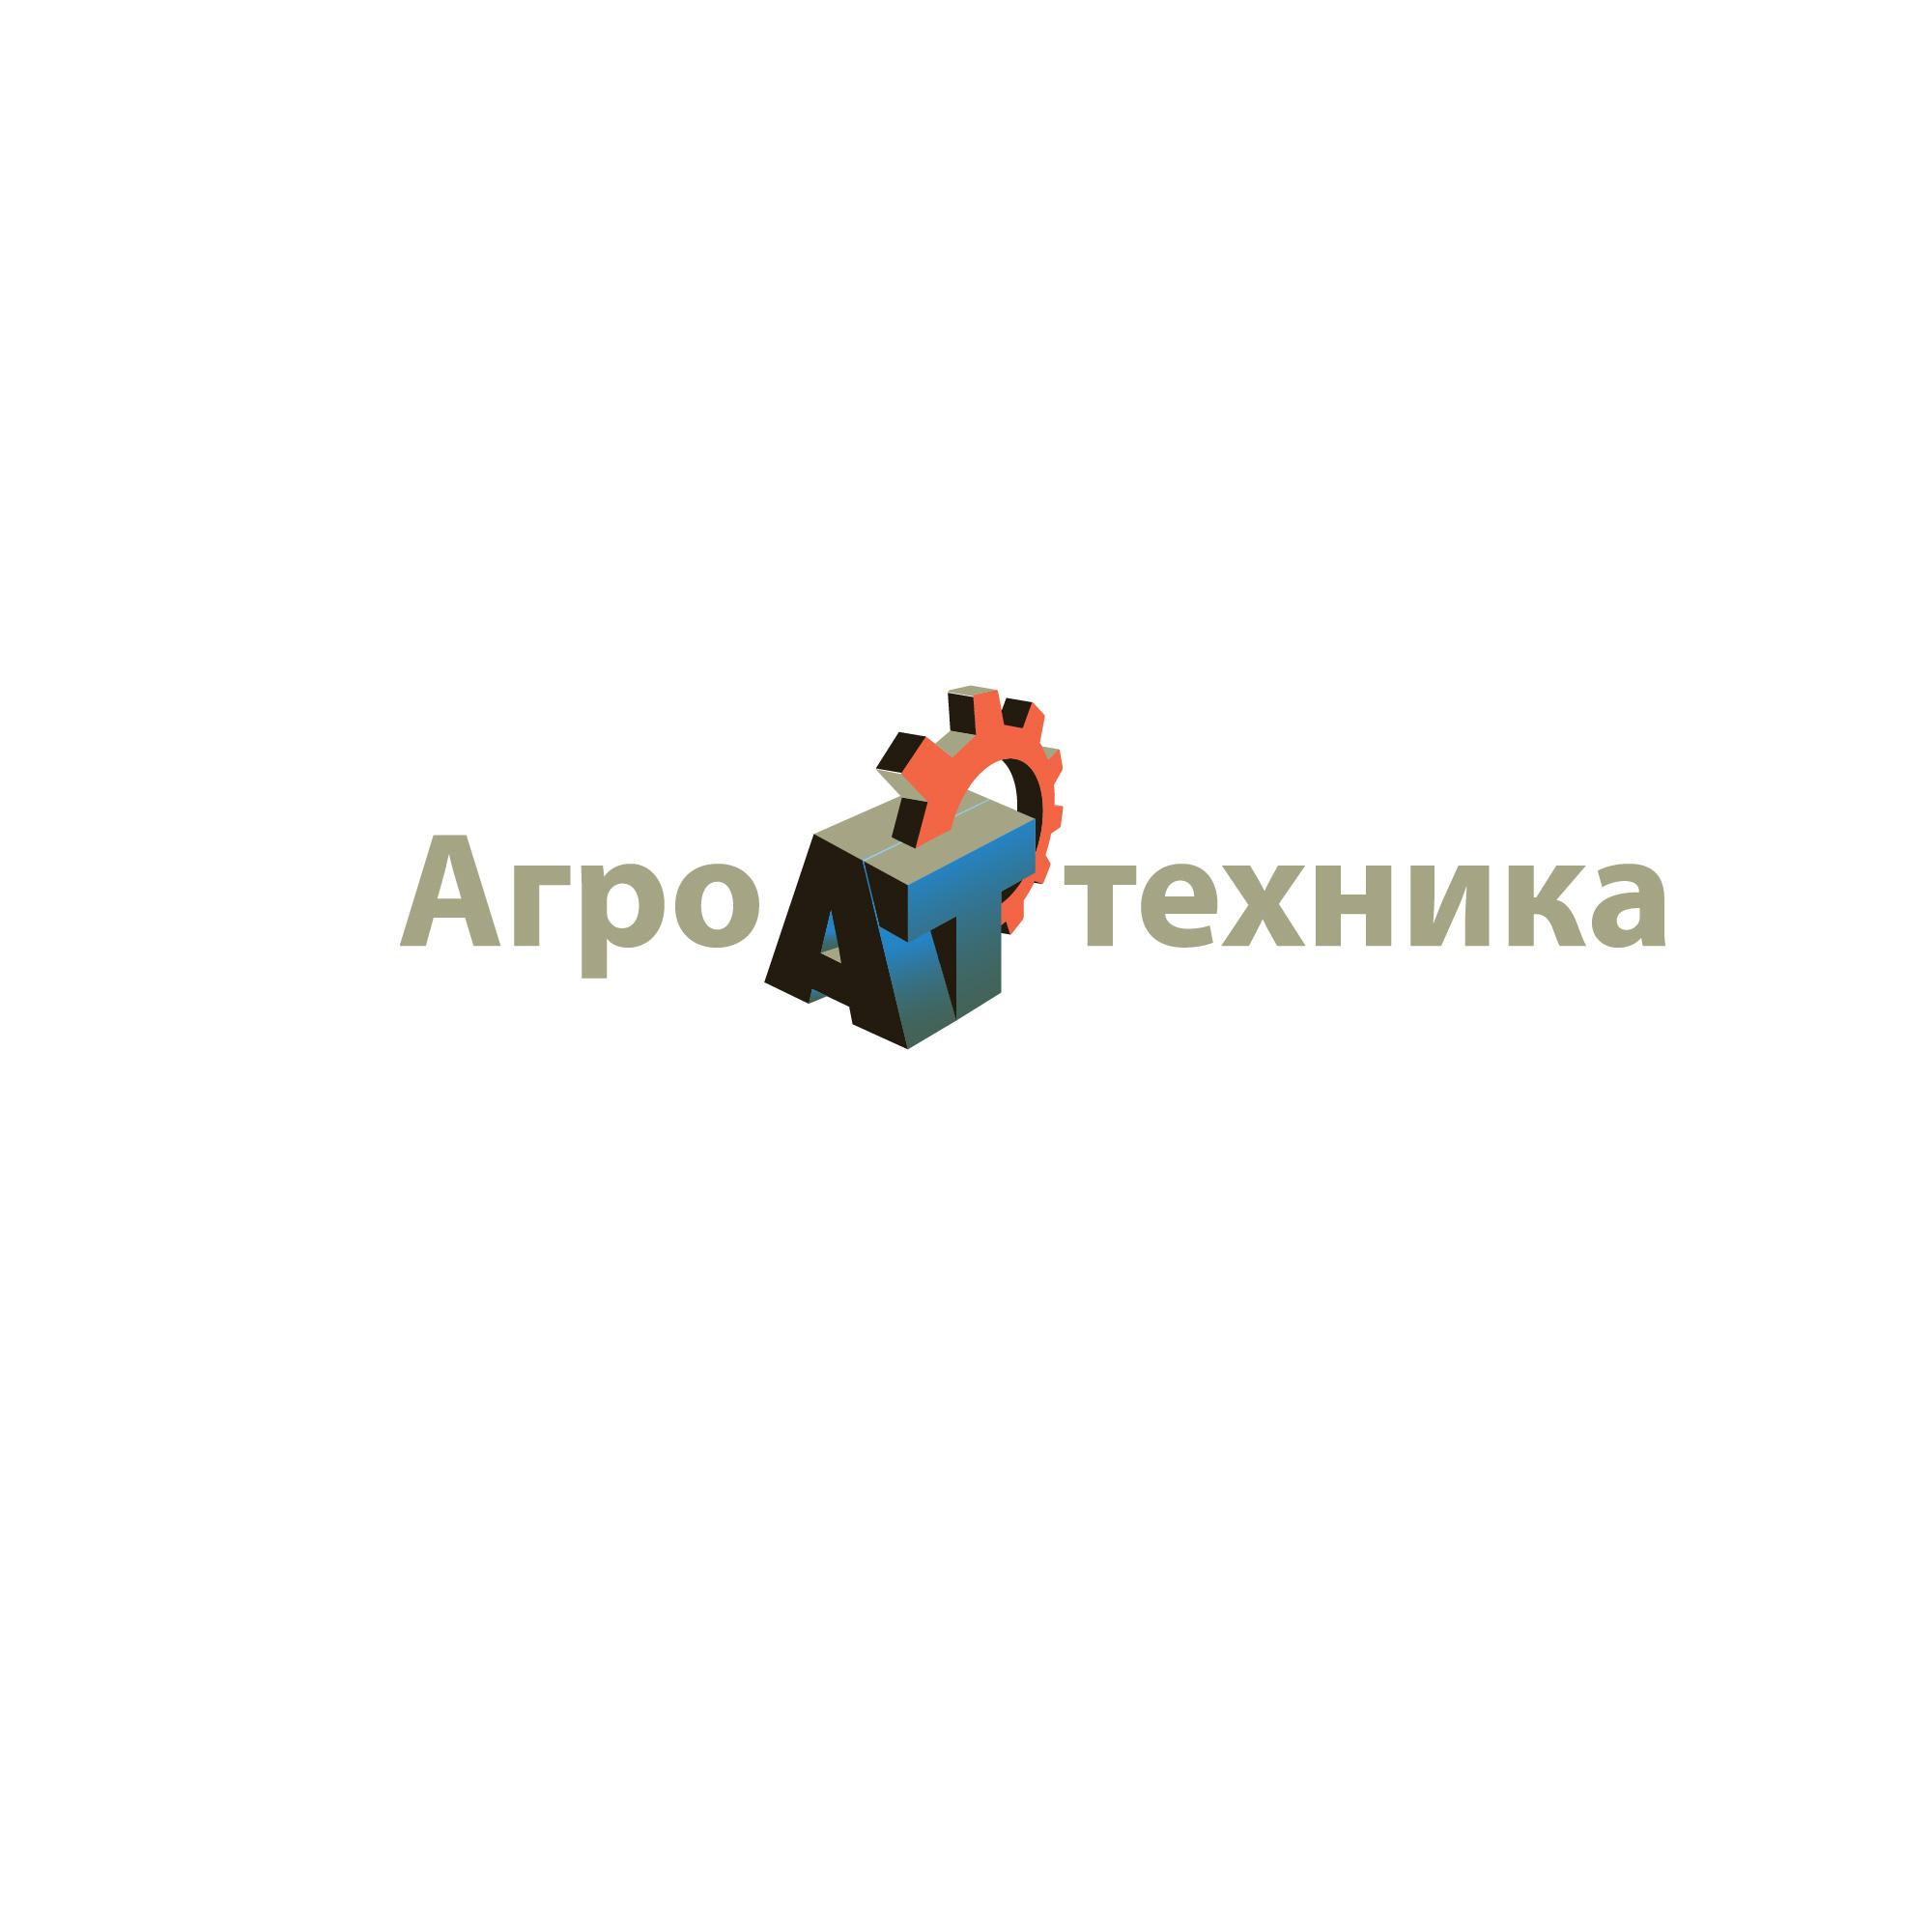 Разработка логотипа для компании Агротехника фото f_2155c0652bfcbd7a.jpg